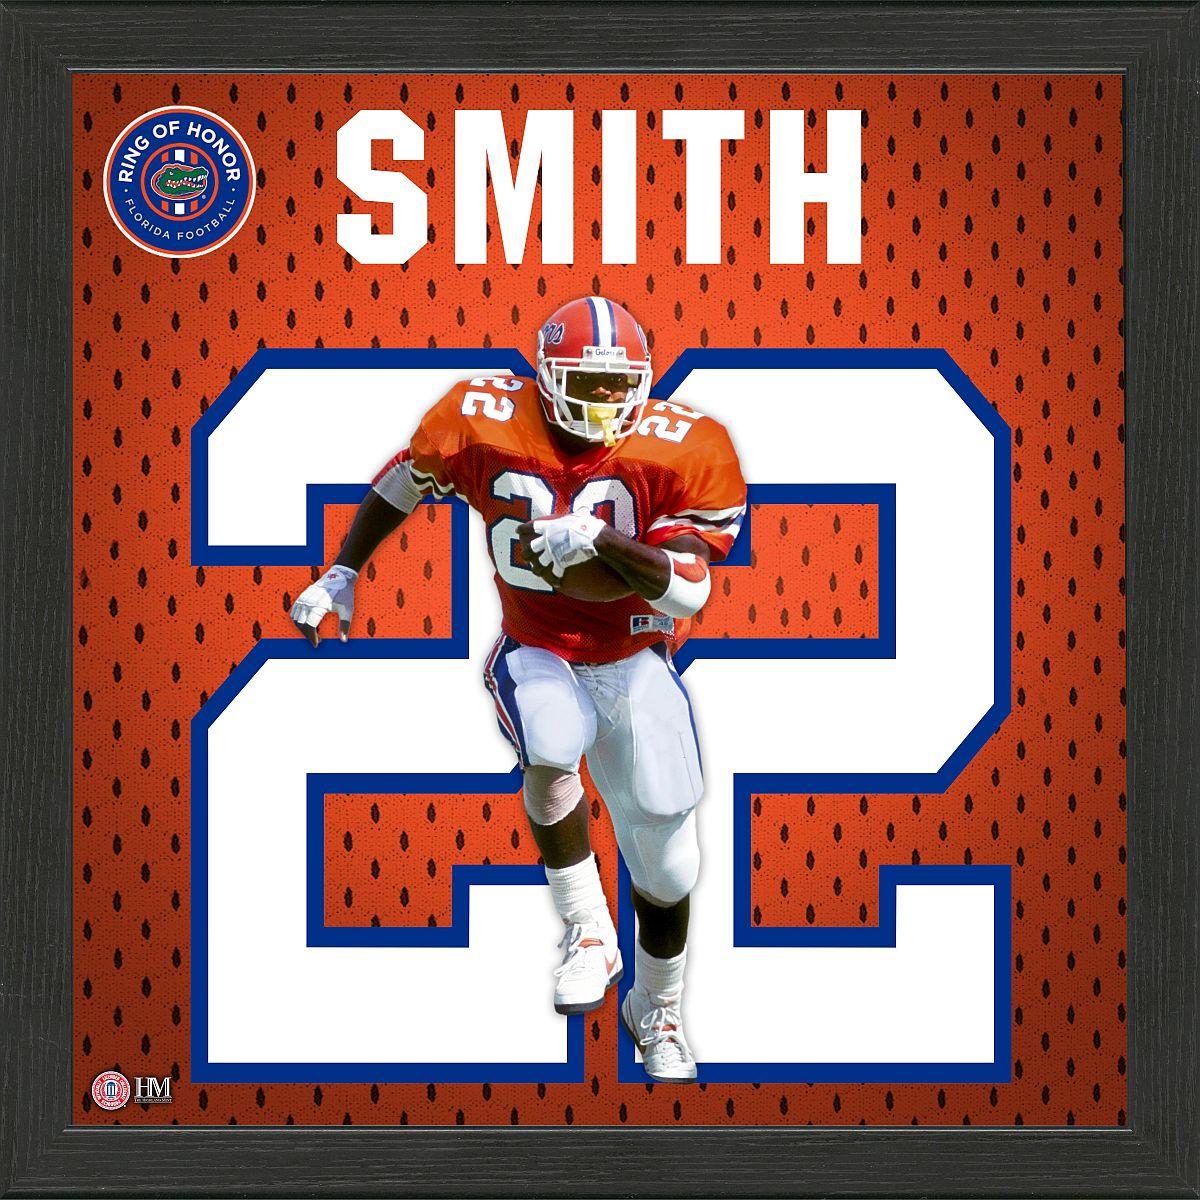 Emmitt Smith Florida Gators 2020 Ring of Honor Jersey Framed Photo